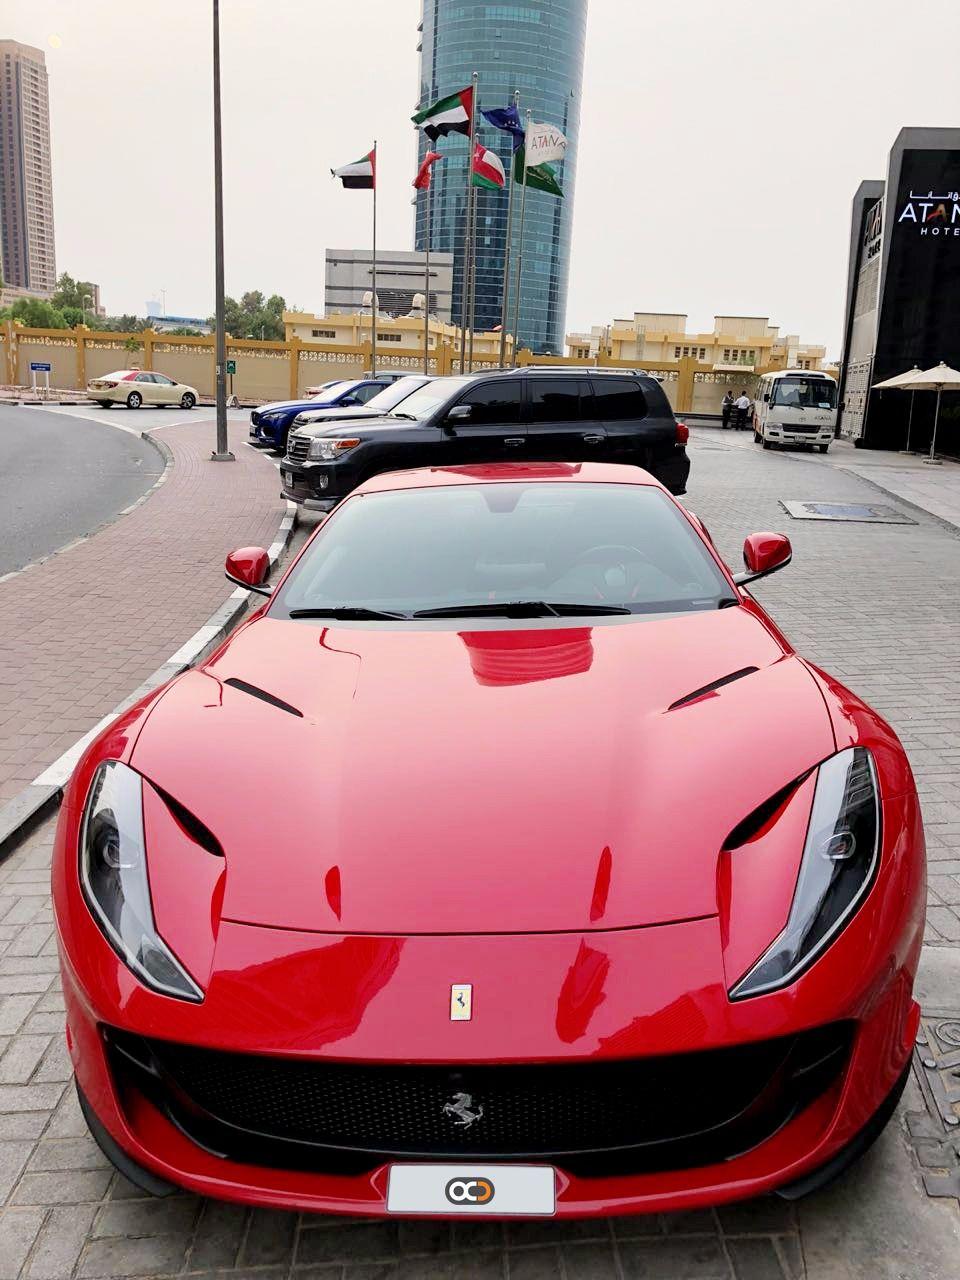 Drive The Iconic 2018 Ferrari 812 Superfast In Dubai For Only Aed 5500 Day Rental Cost Includes Comprehensive Insurance Dubai Cars Ferrari Sedan Cars